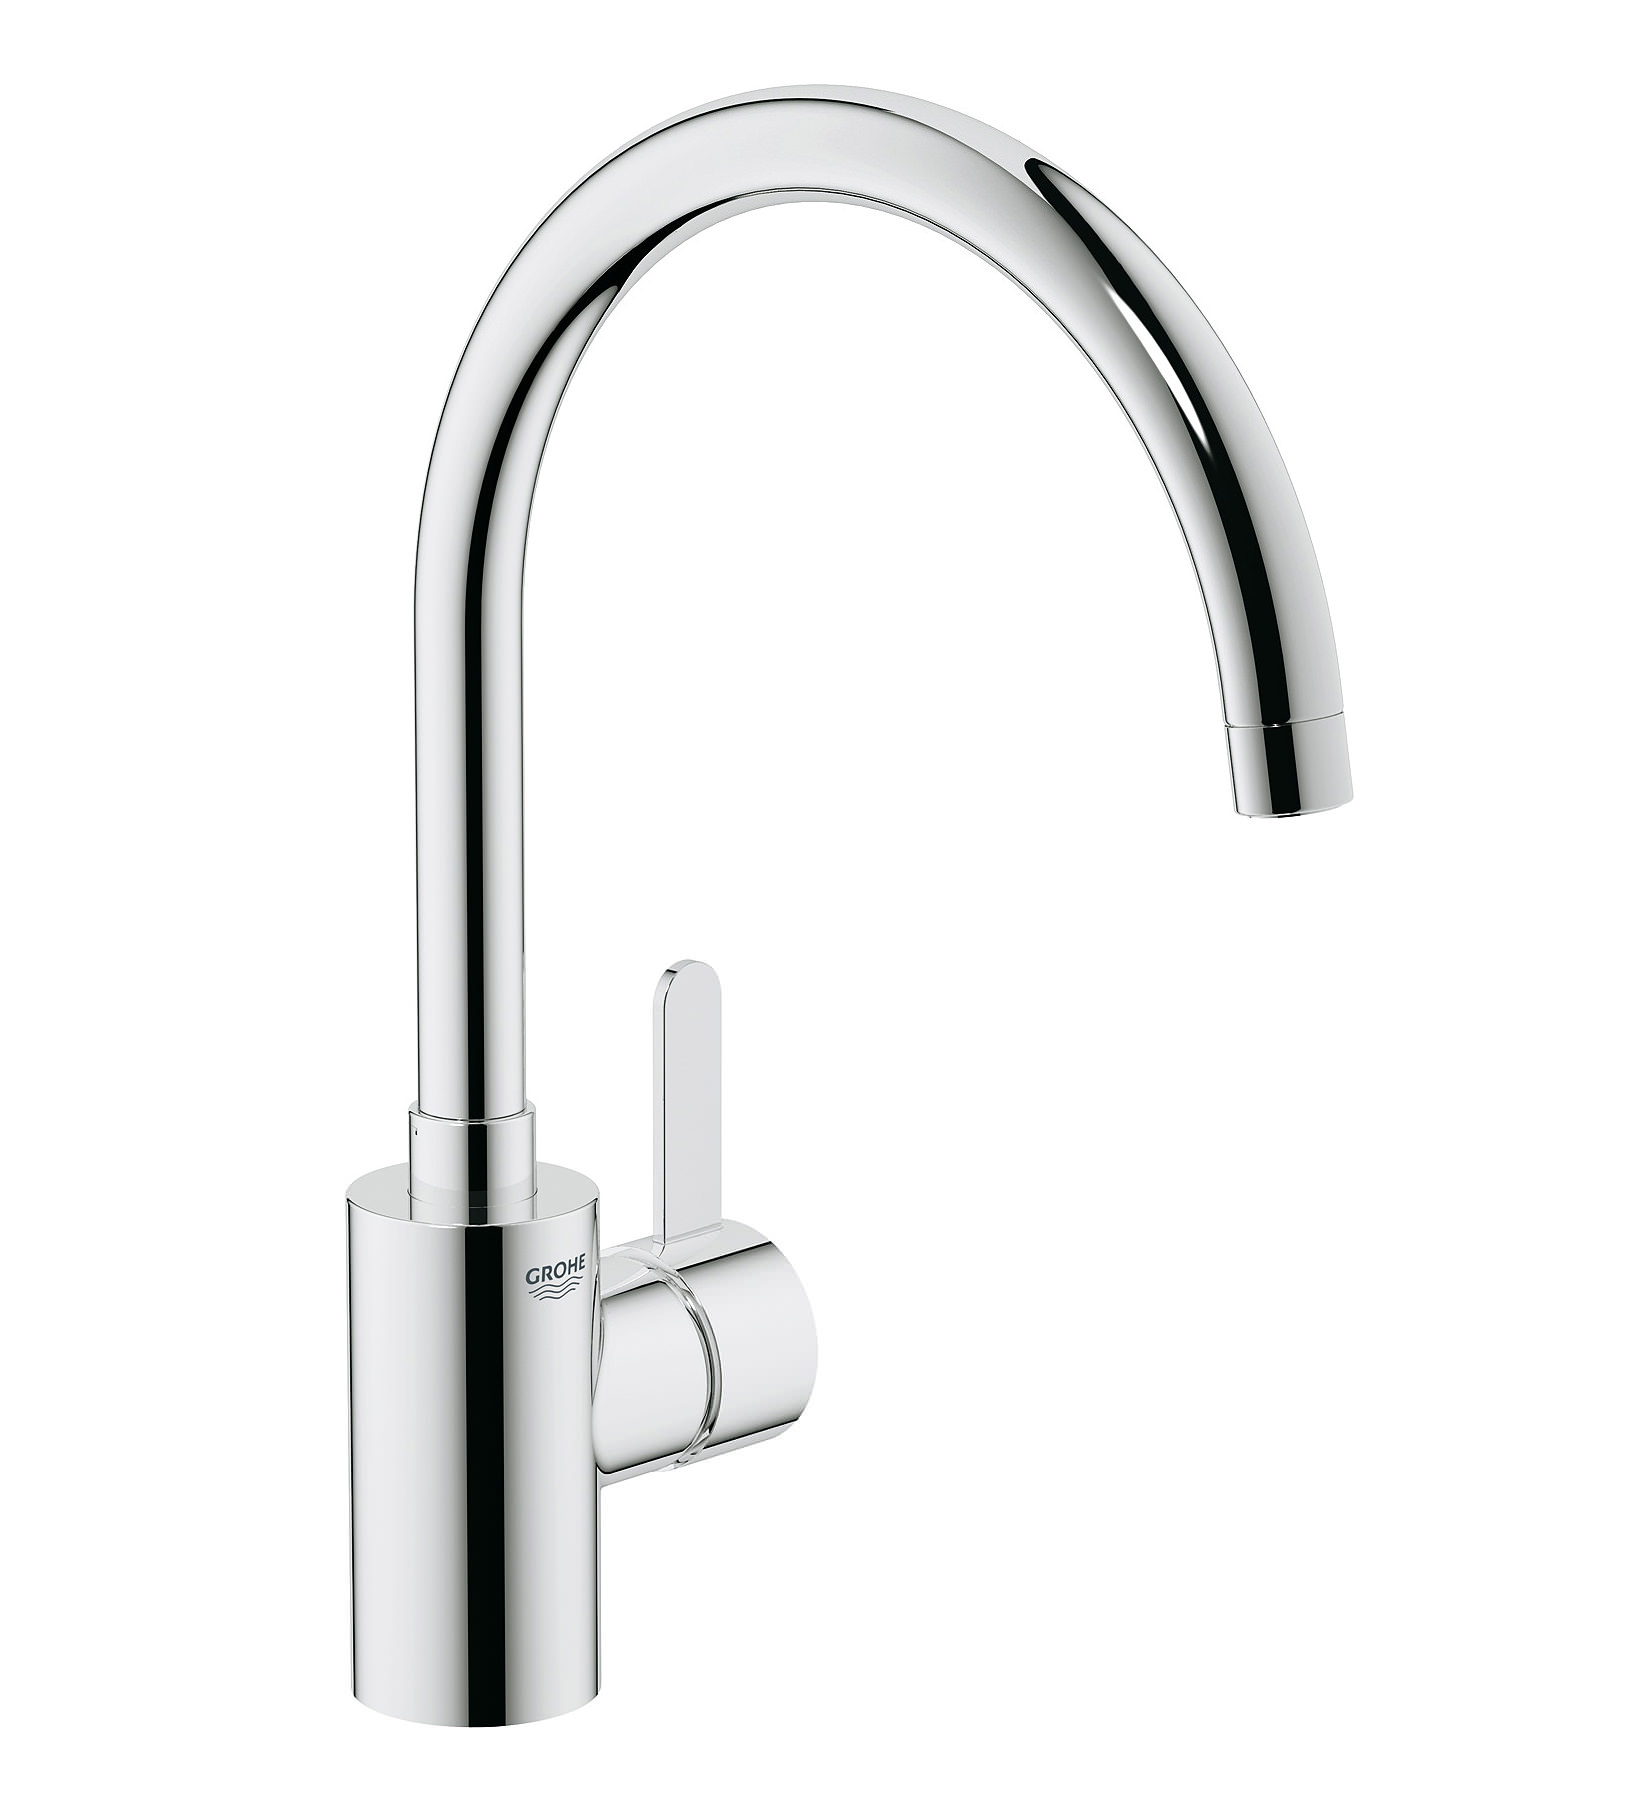 Grohe Eurosmart Cosmopolitan High Spout Monobloc Sink Mixer Tap